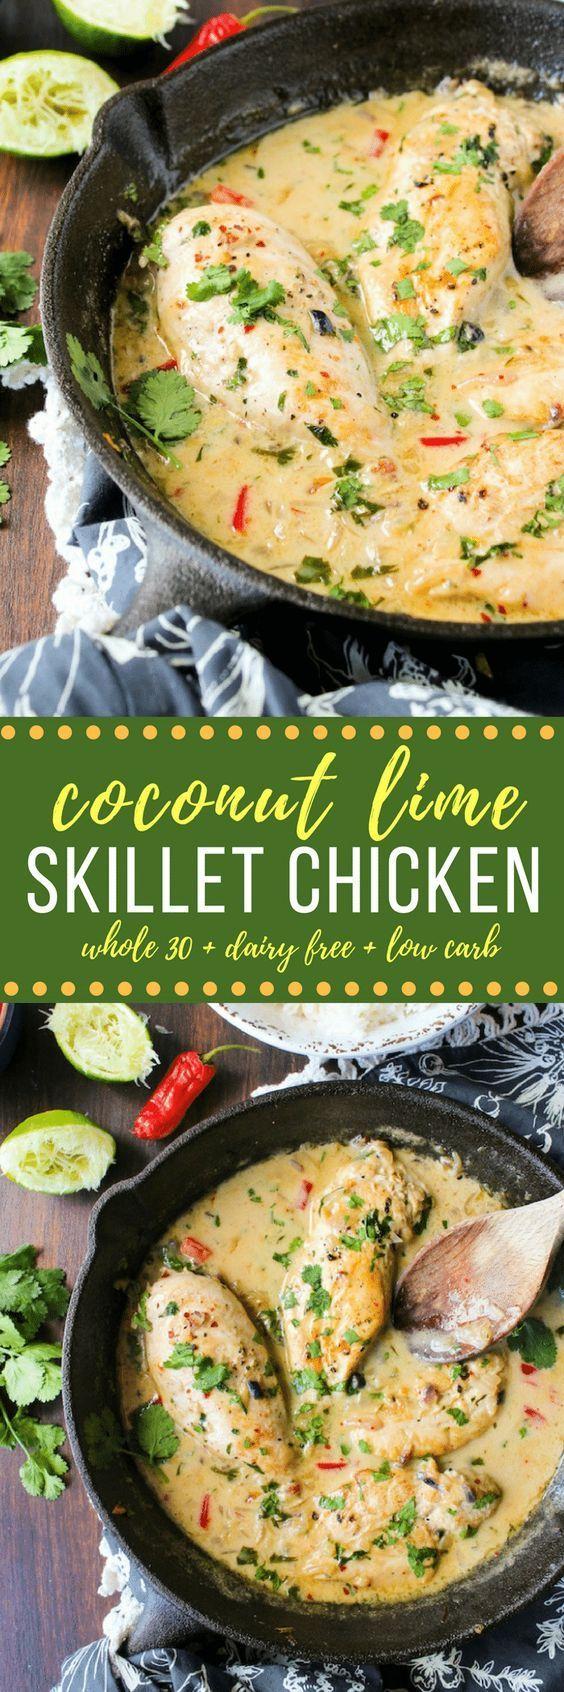 Coconut Lime Chicken Recipe Whole 30 recipes